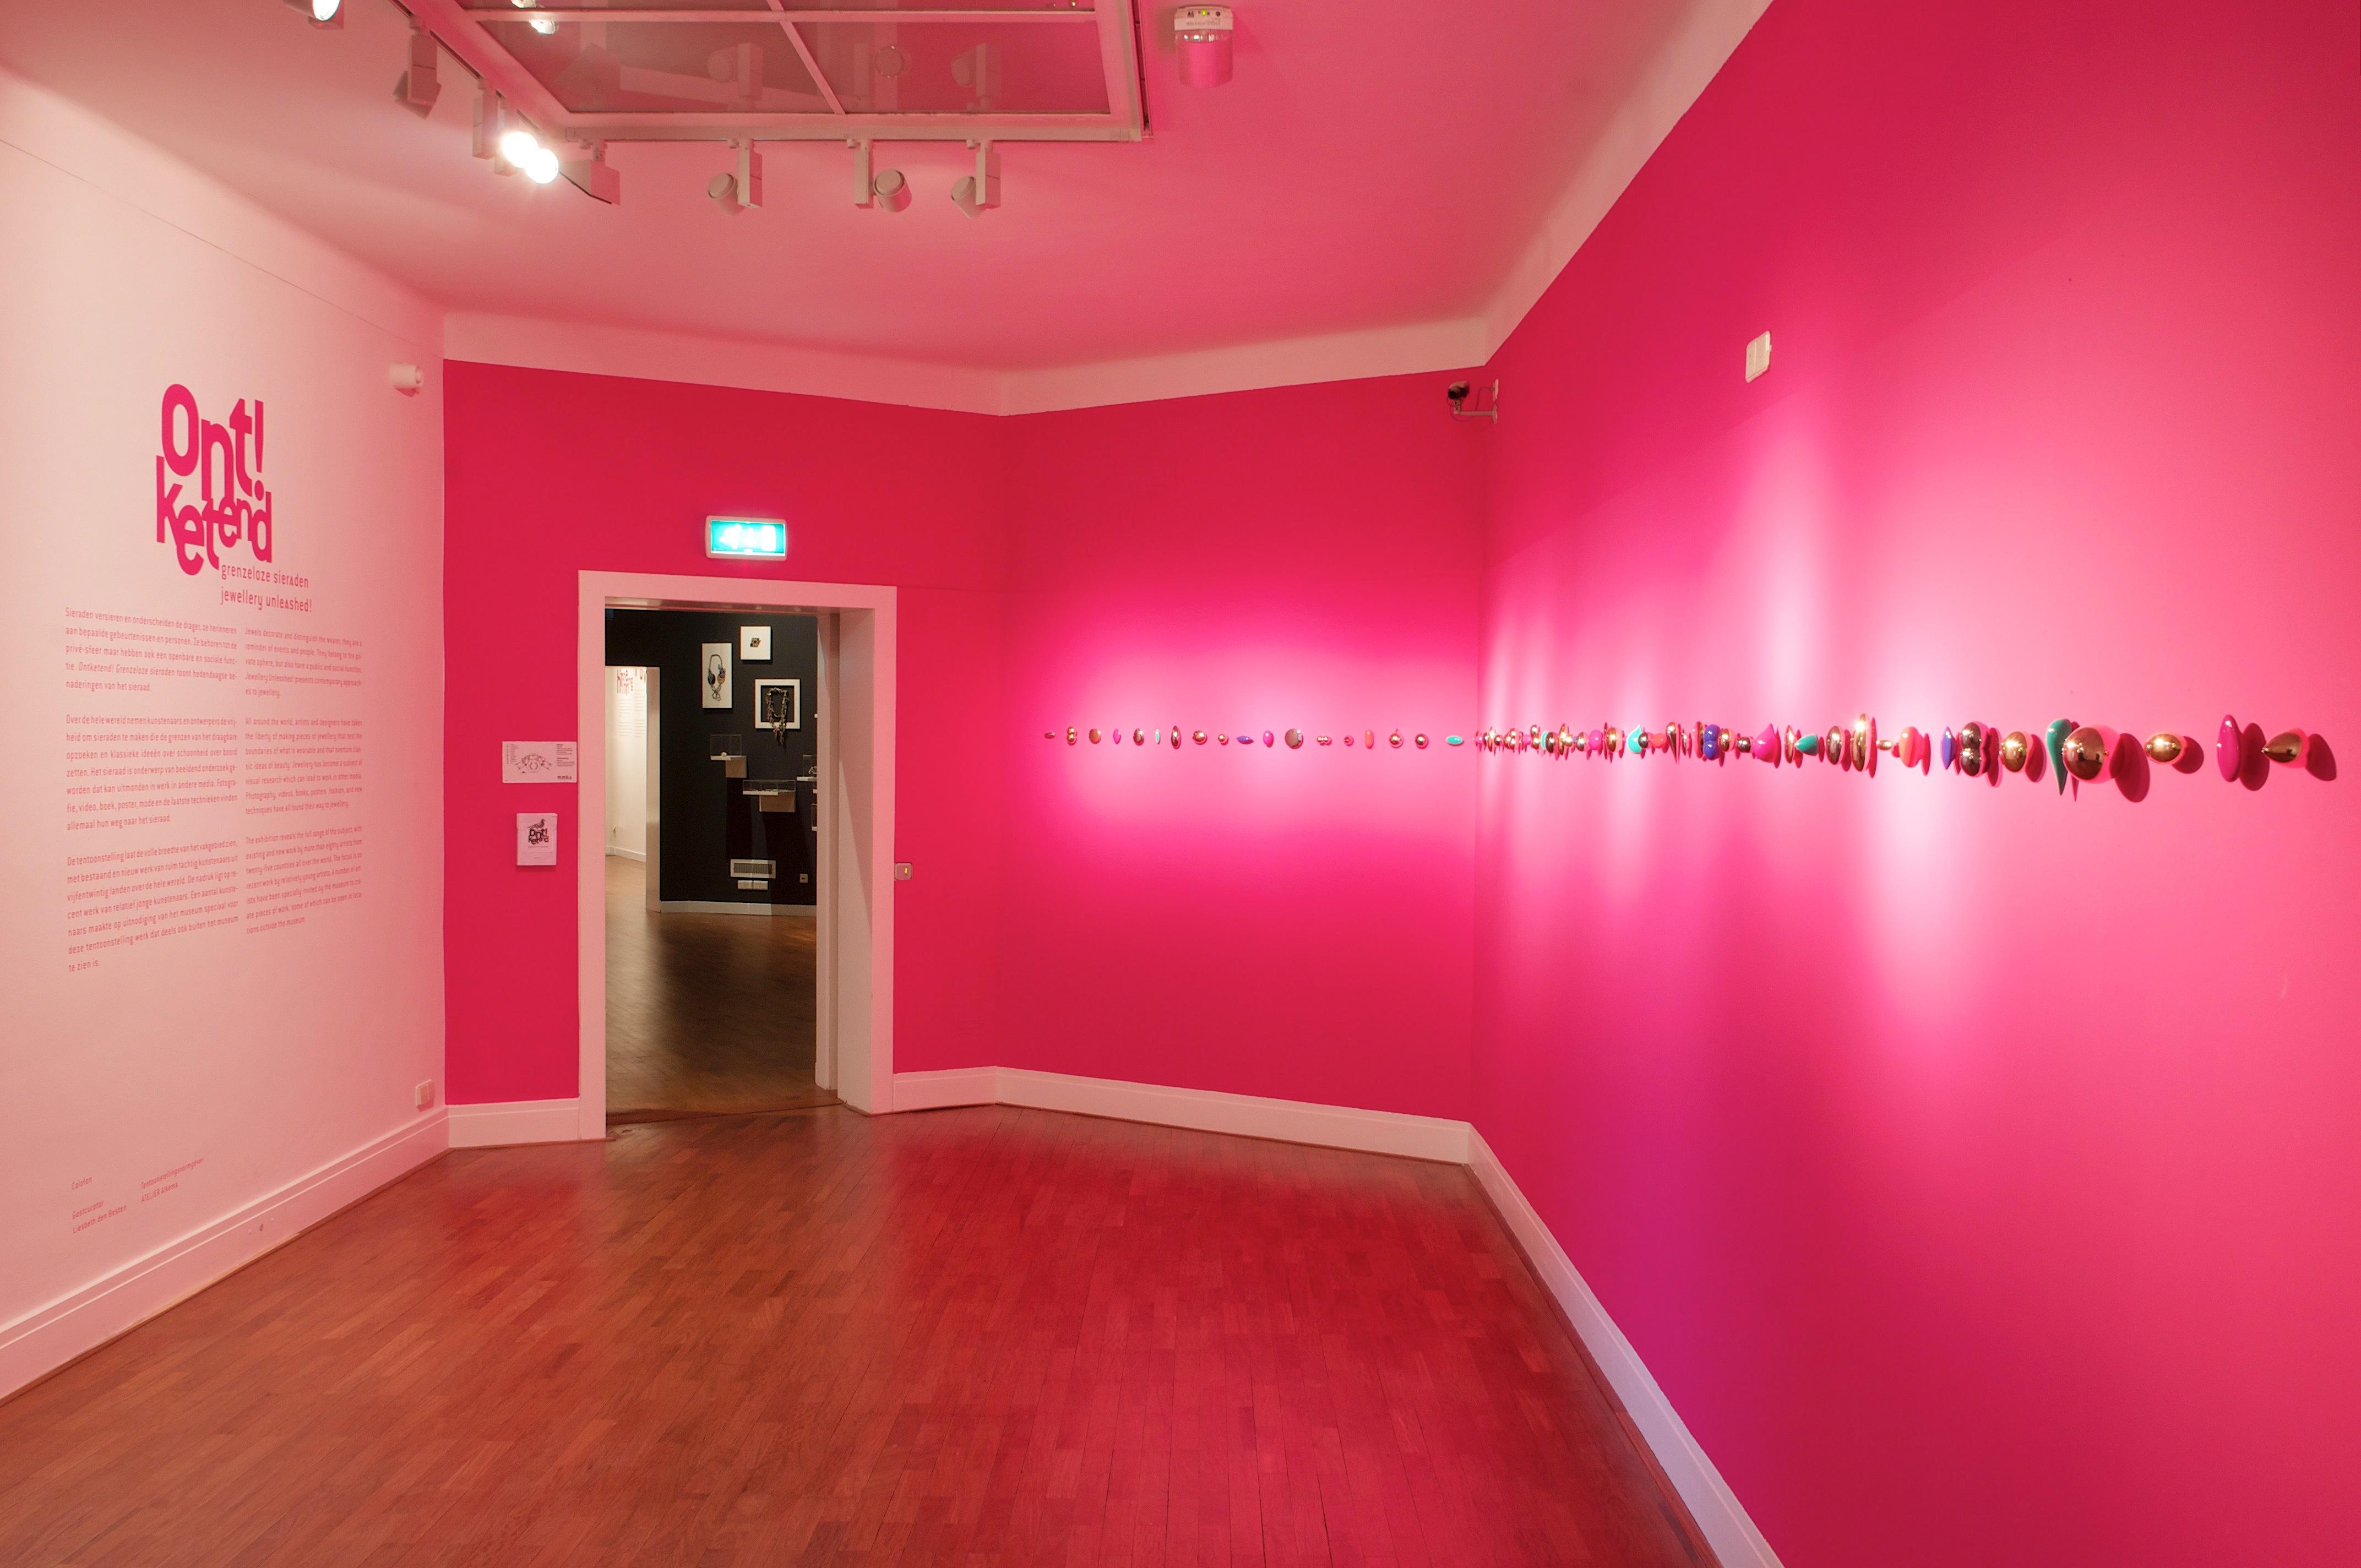 Ontketend, Museum voor Moderne Kunst Arnhem, 2011, tentoonstelling, Noon Passama, broches